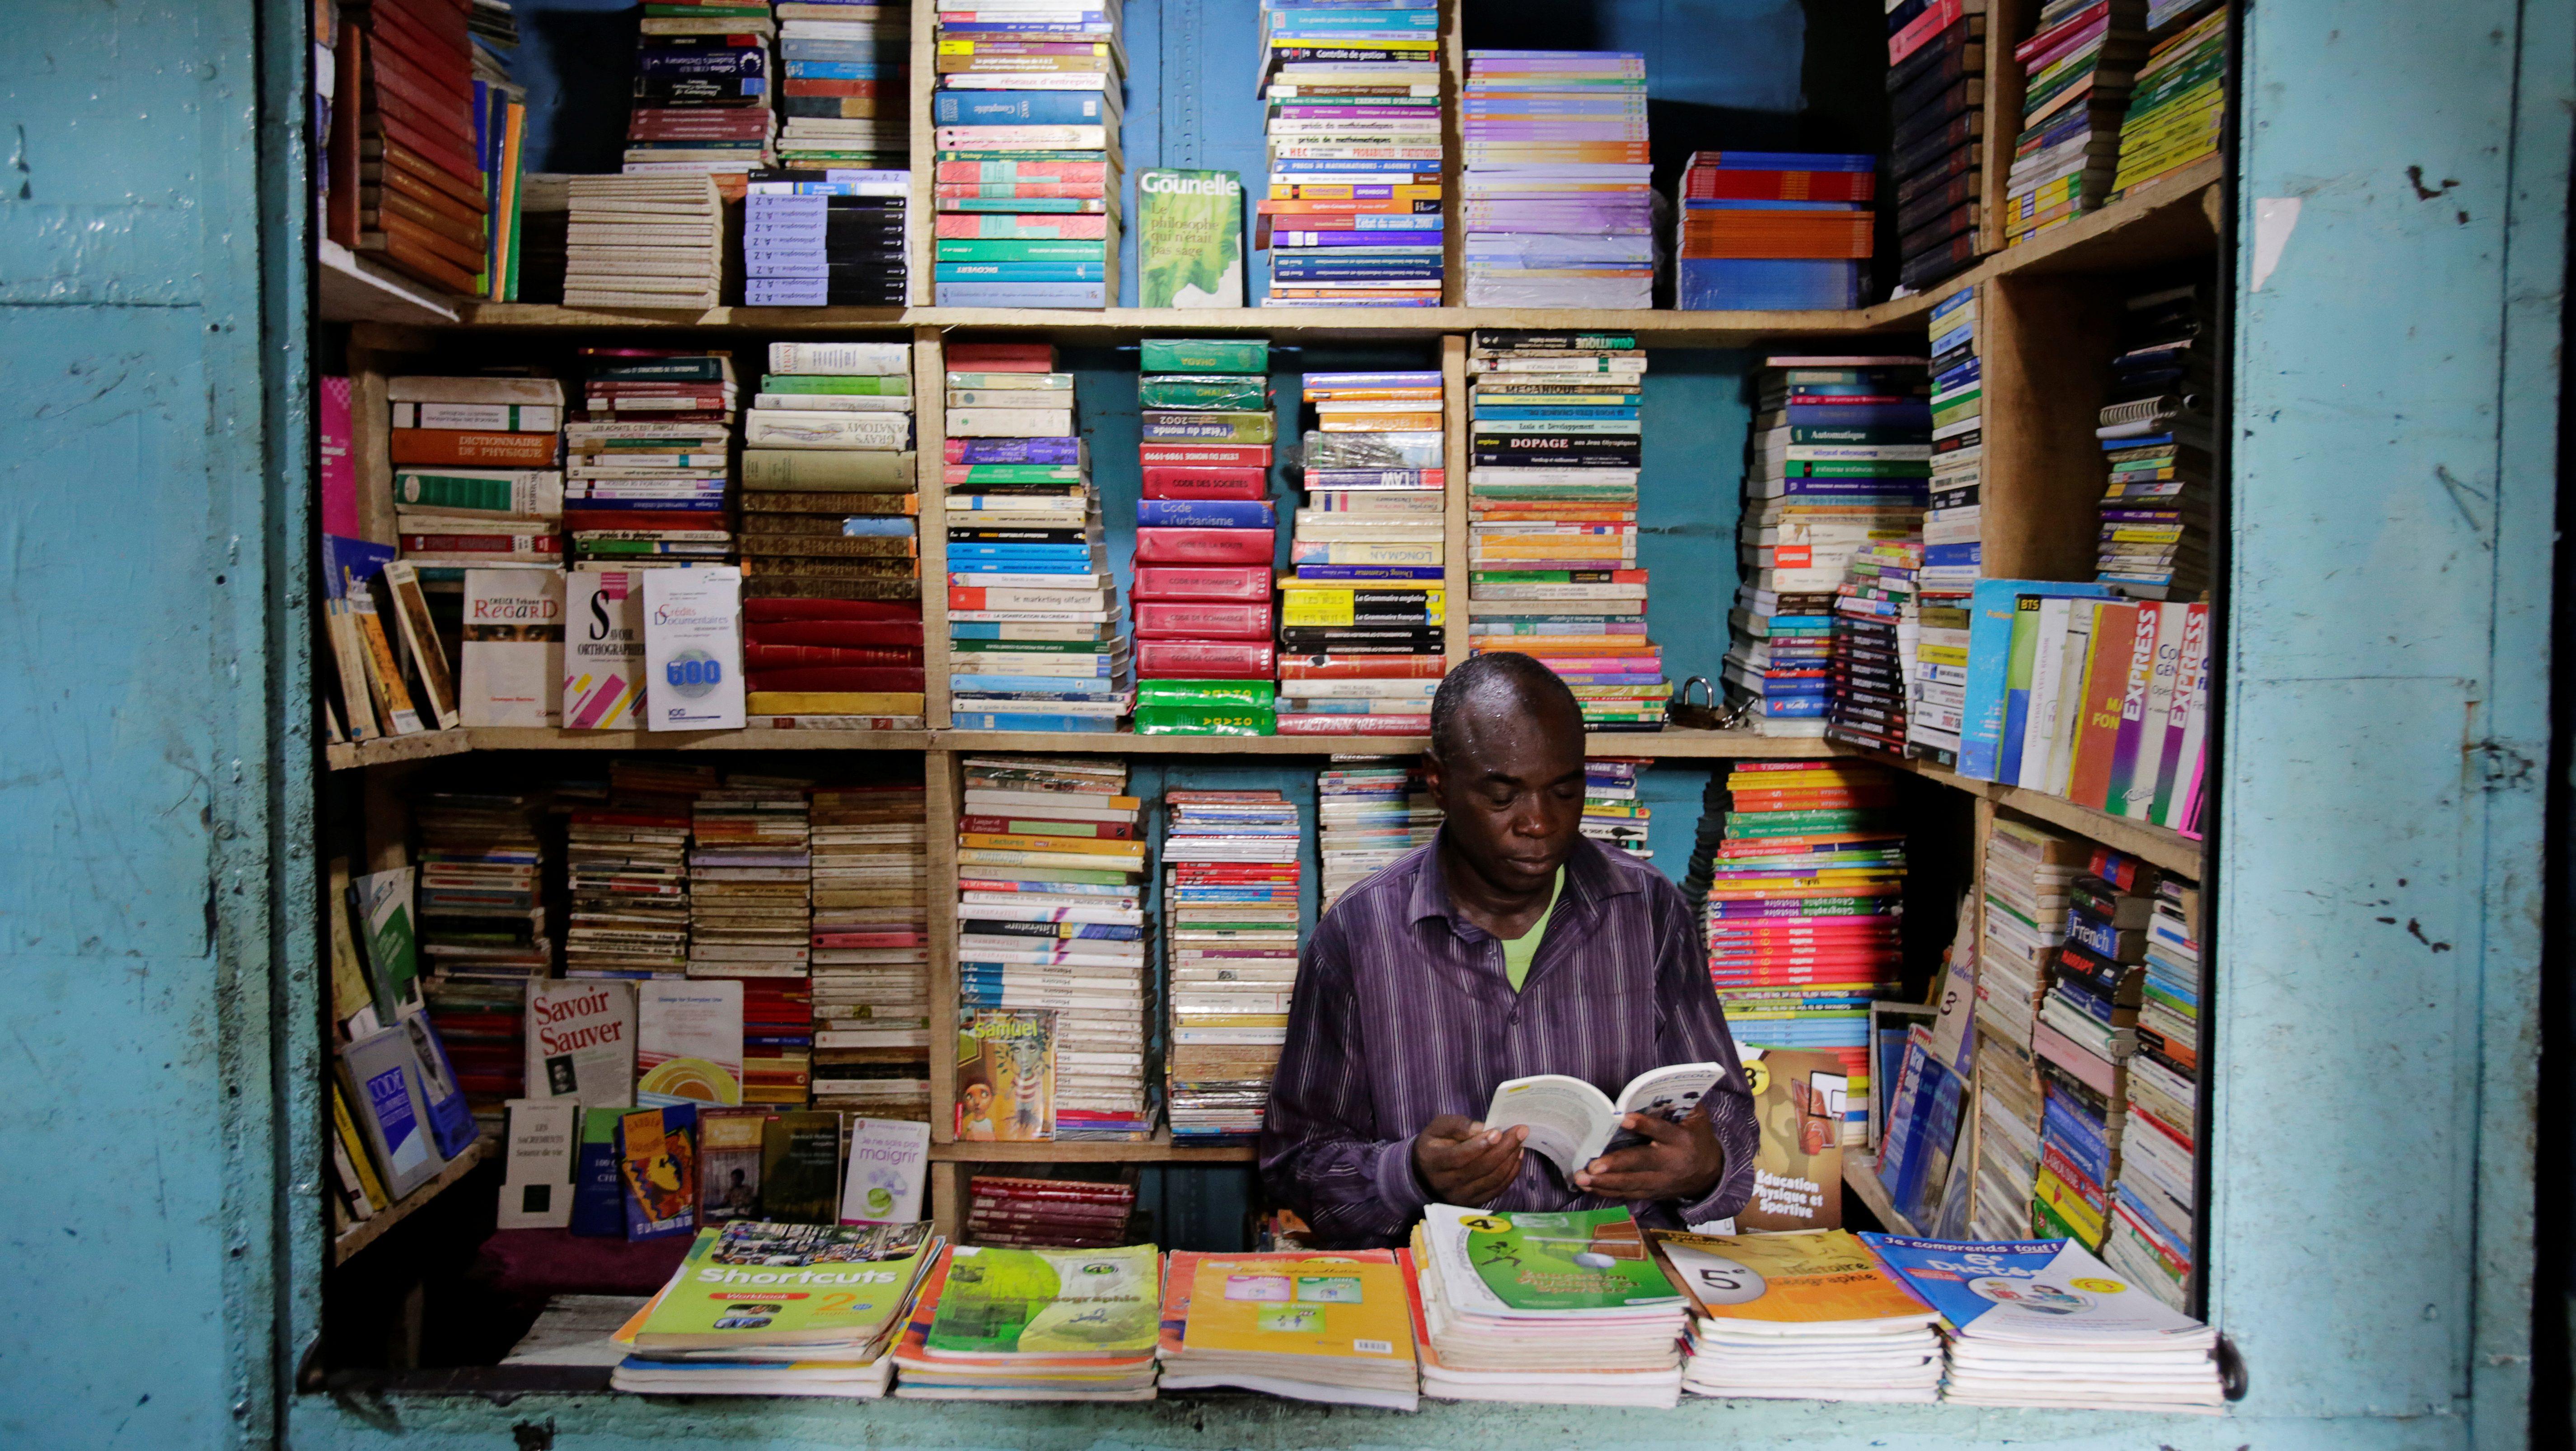 A school book seller is seen at Adjame market in Abidjan, Ivory Coast, September 13, 2018. Picture taken September 13, 2018.